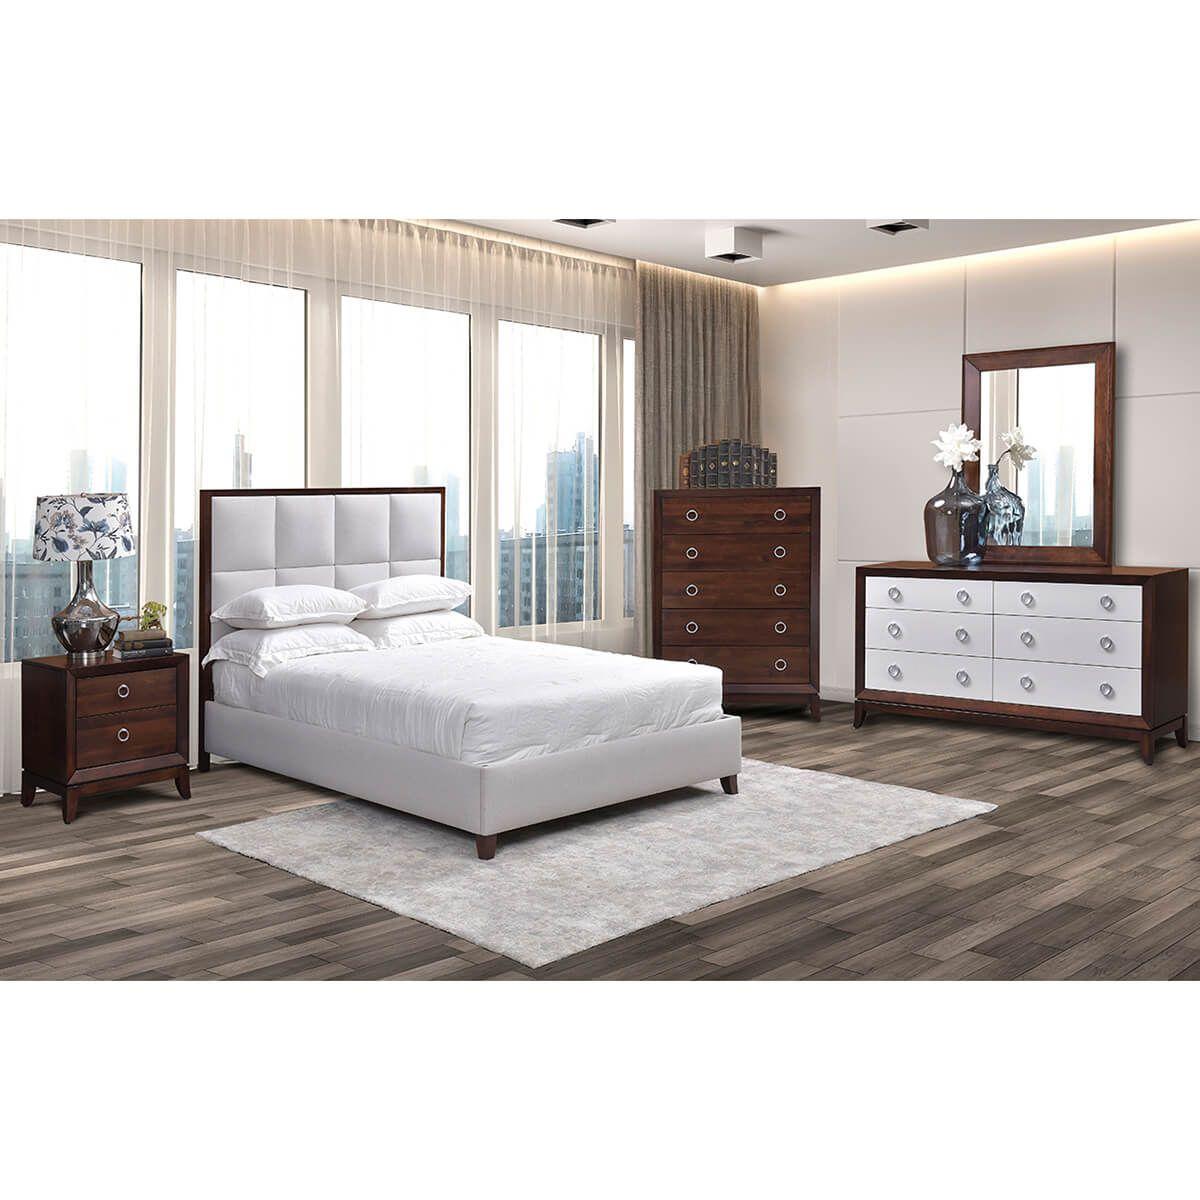 Uptown Bedroom Collection Bedroom collection, Bedroom